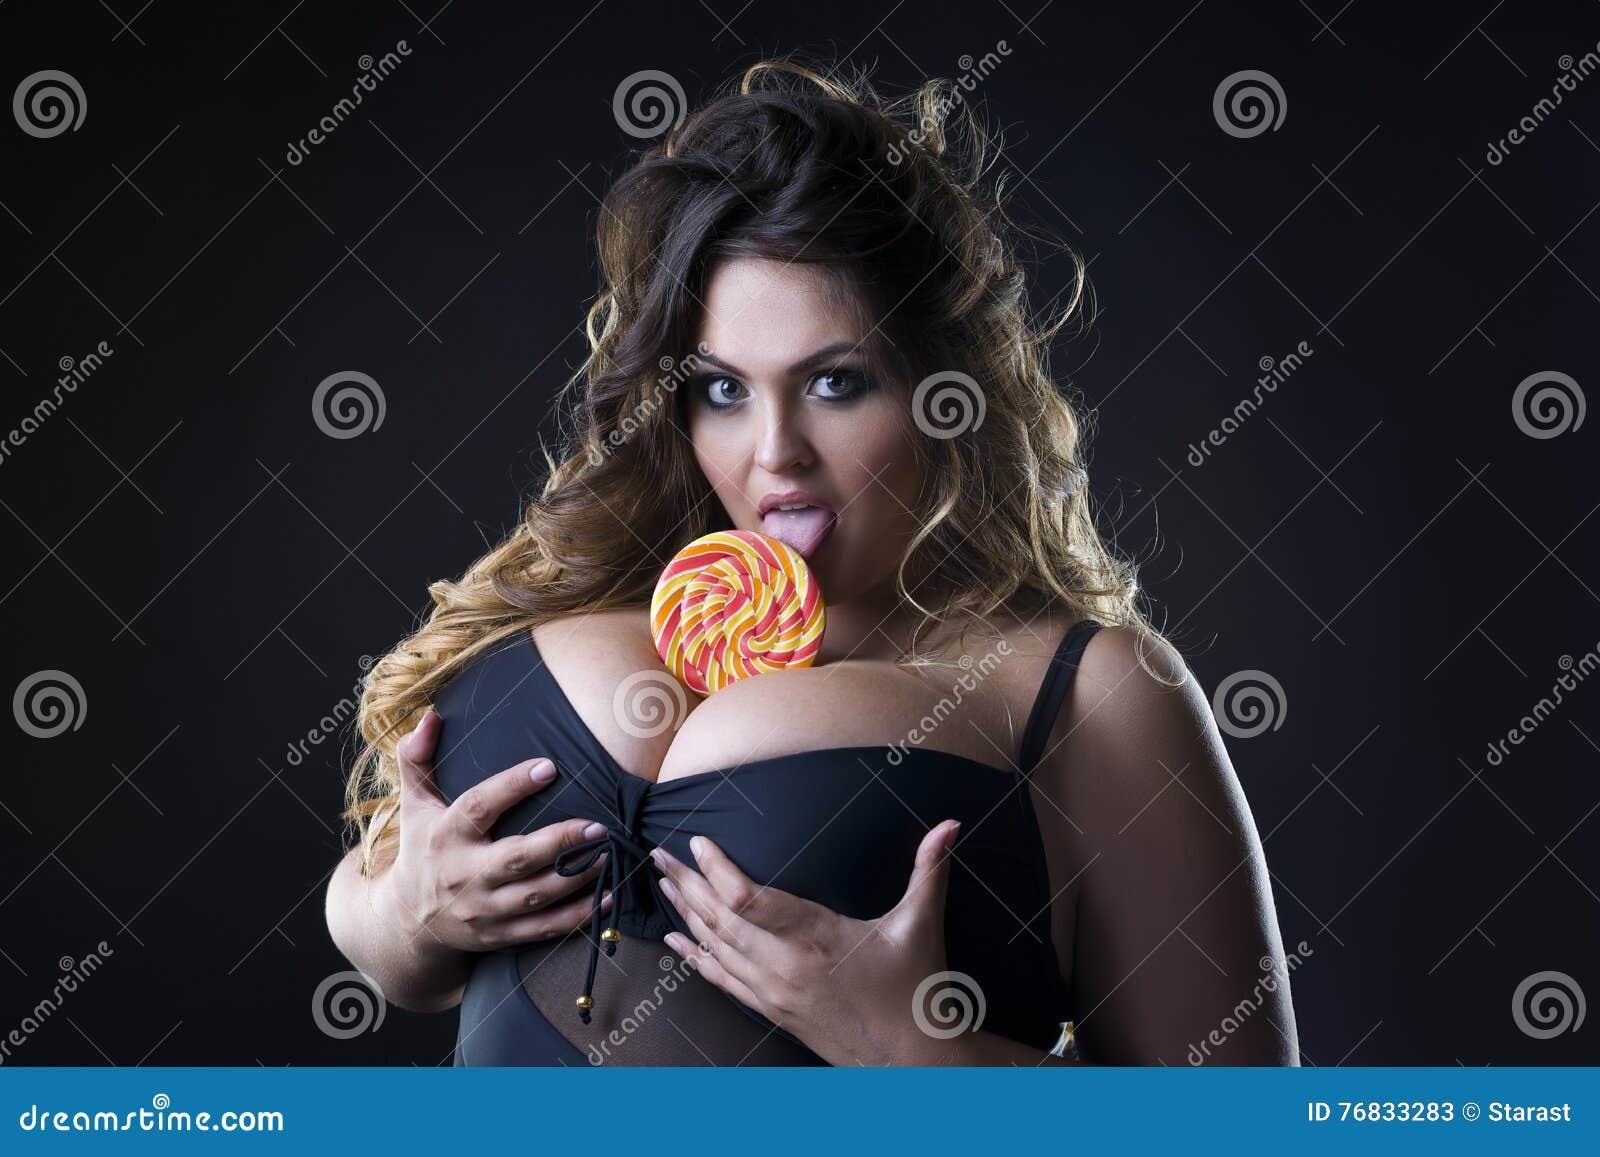 She sucks off multiple cocks free-9482